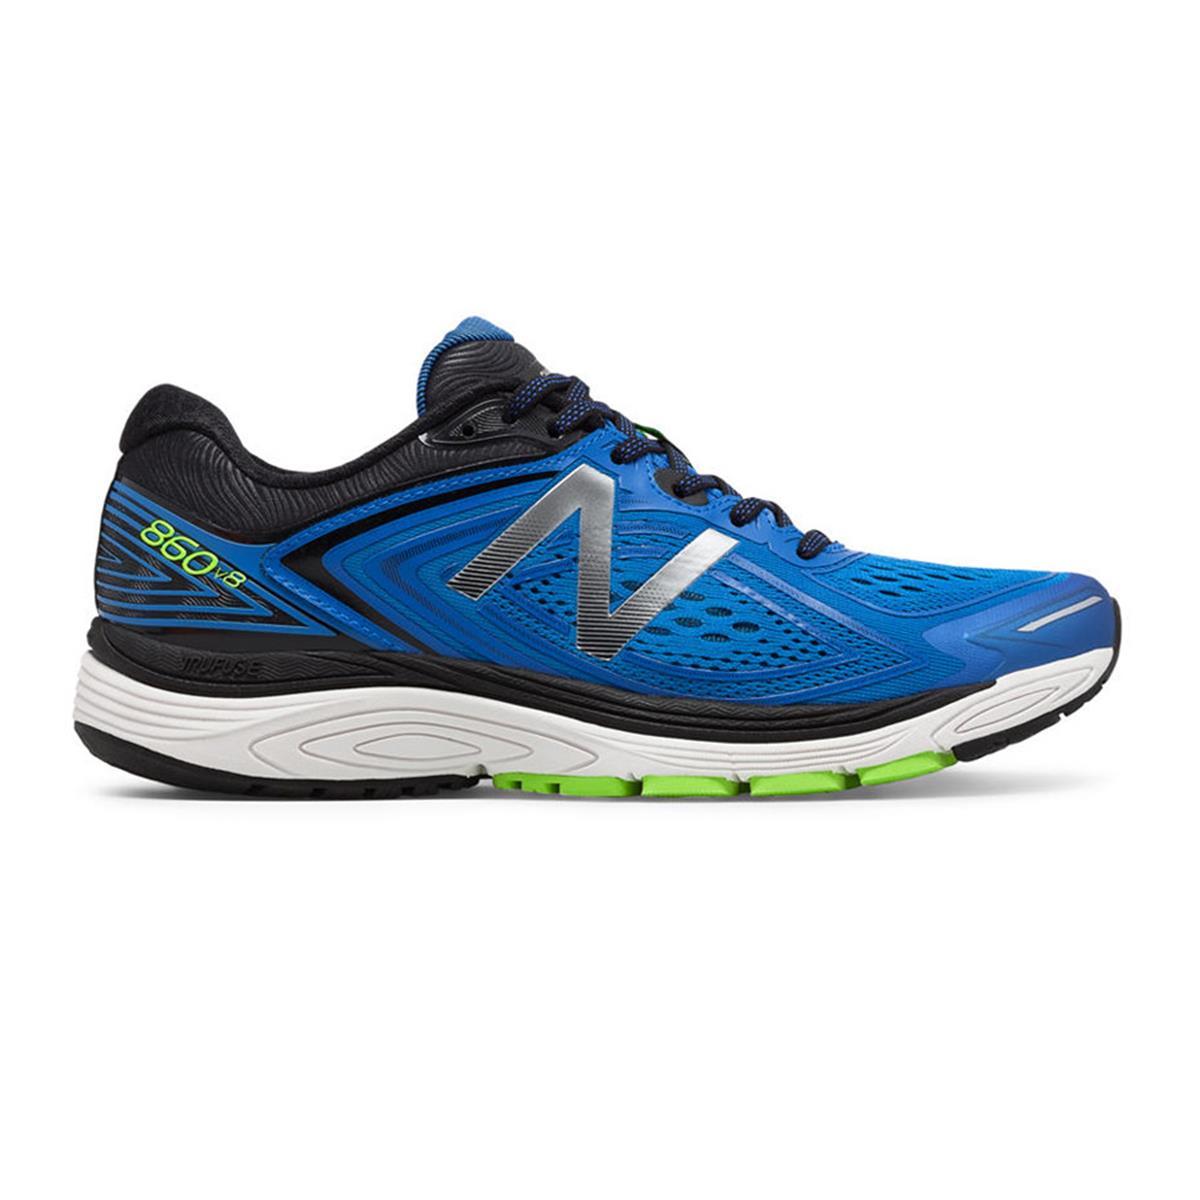 New Balance M860 v8 (2E Width) Mens Running Shoes | Direct